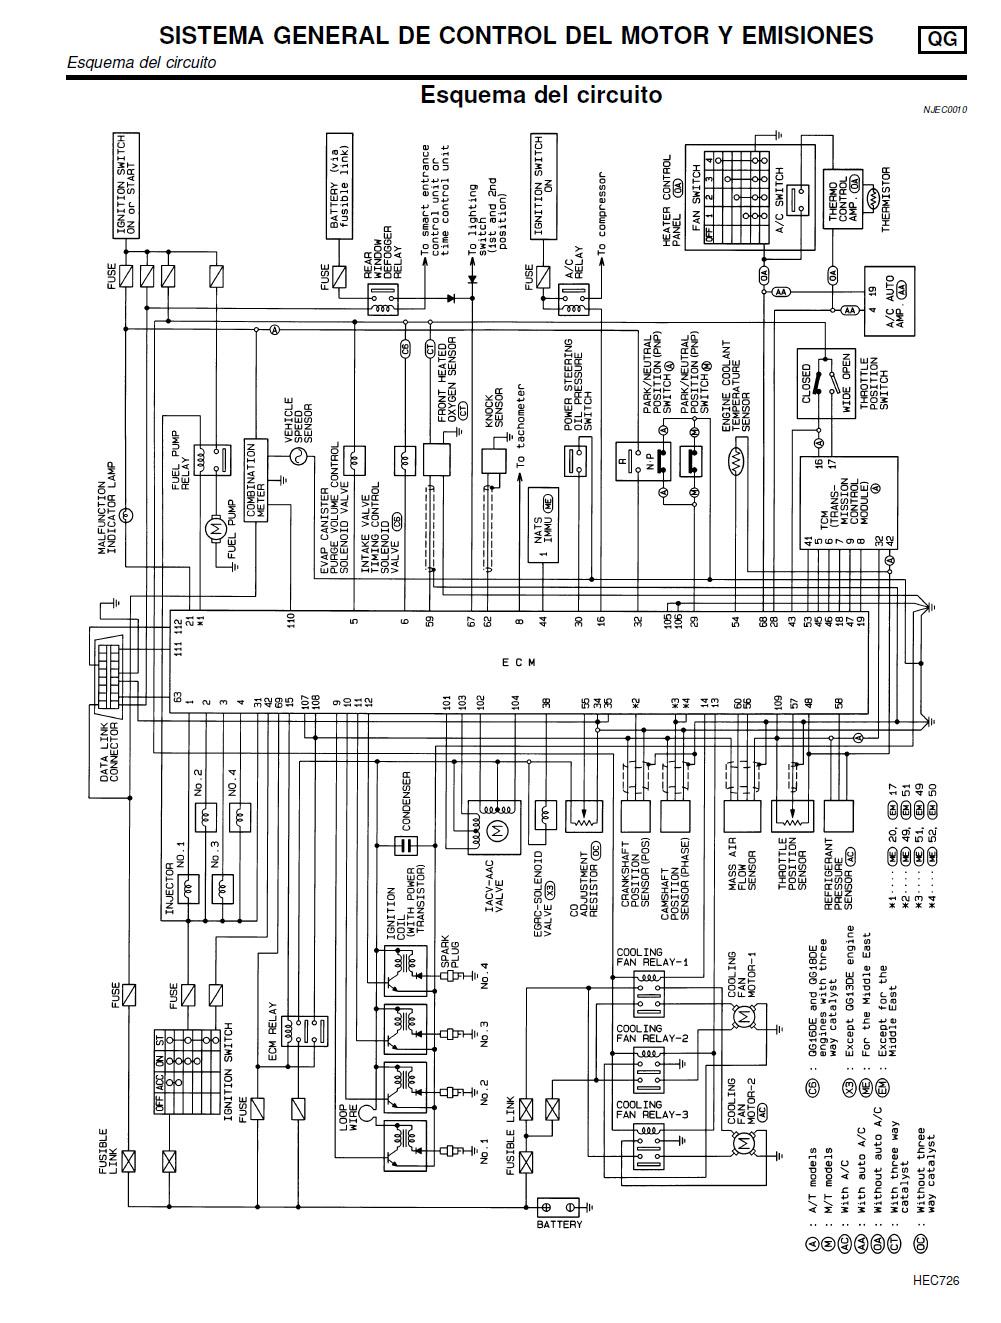 2013 nissan sentra wiring diagram 2013 nissan sentra fuse nissan sentra engine diagram 91 nissan sentra stereo wiring diagram [ 1001 x 1323 Pixel ]